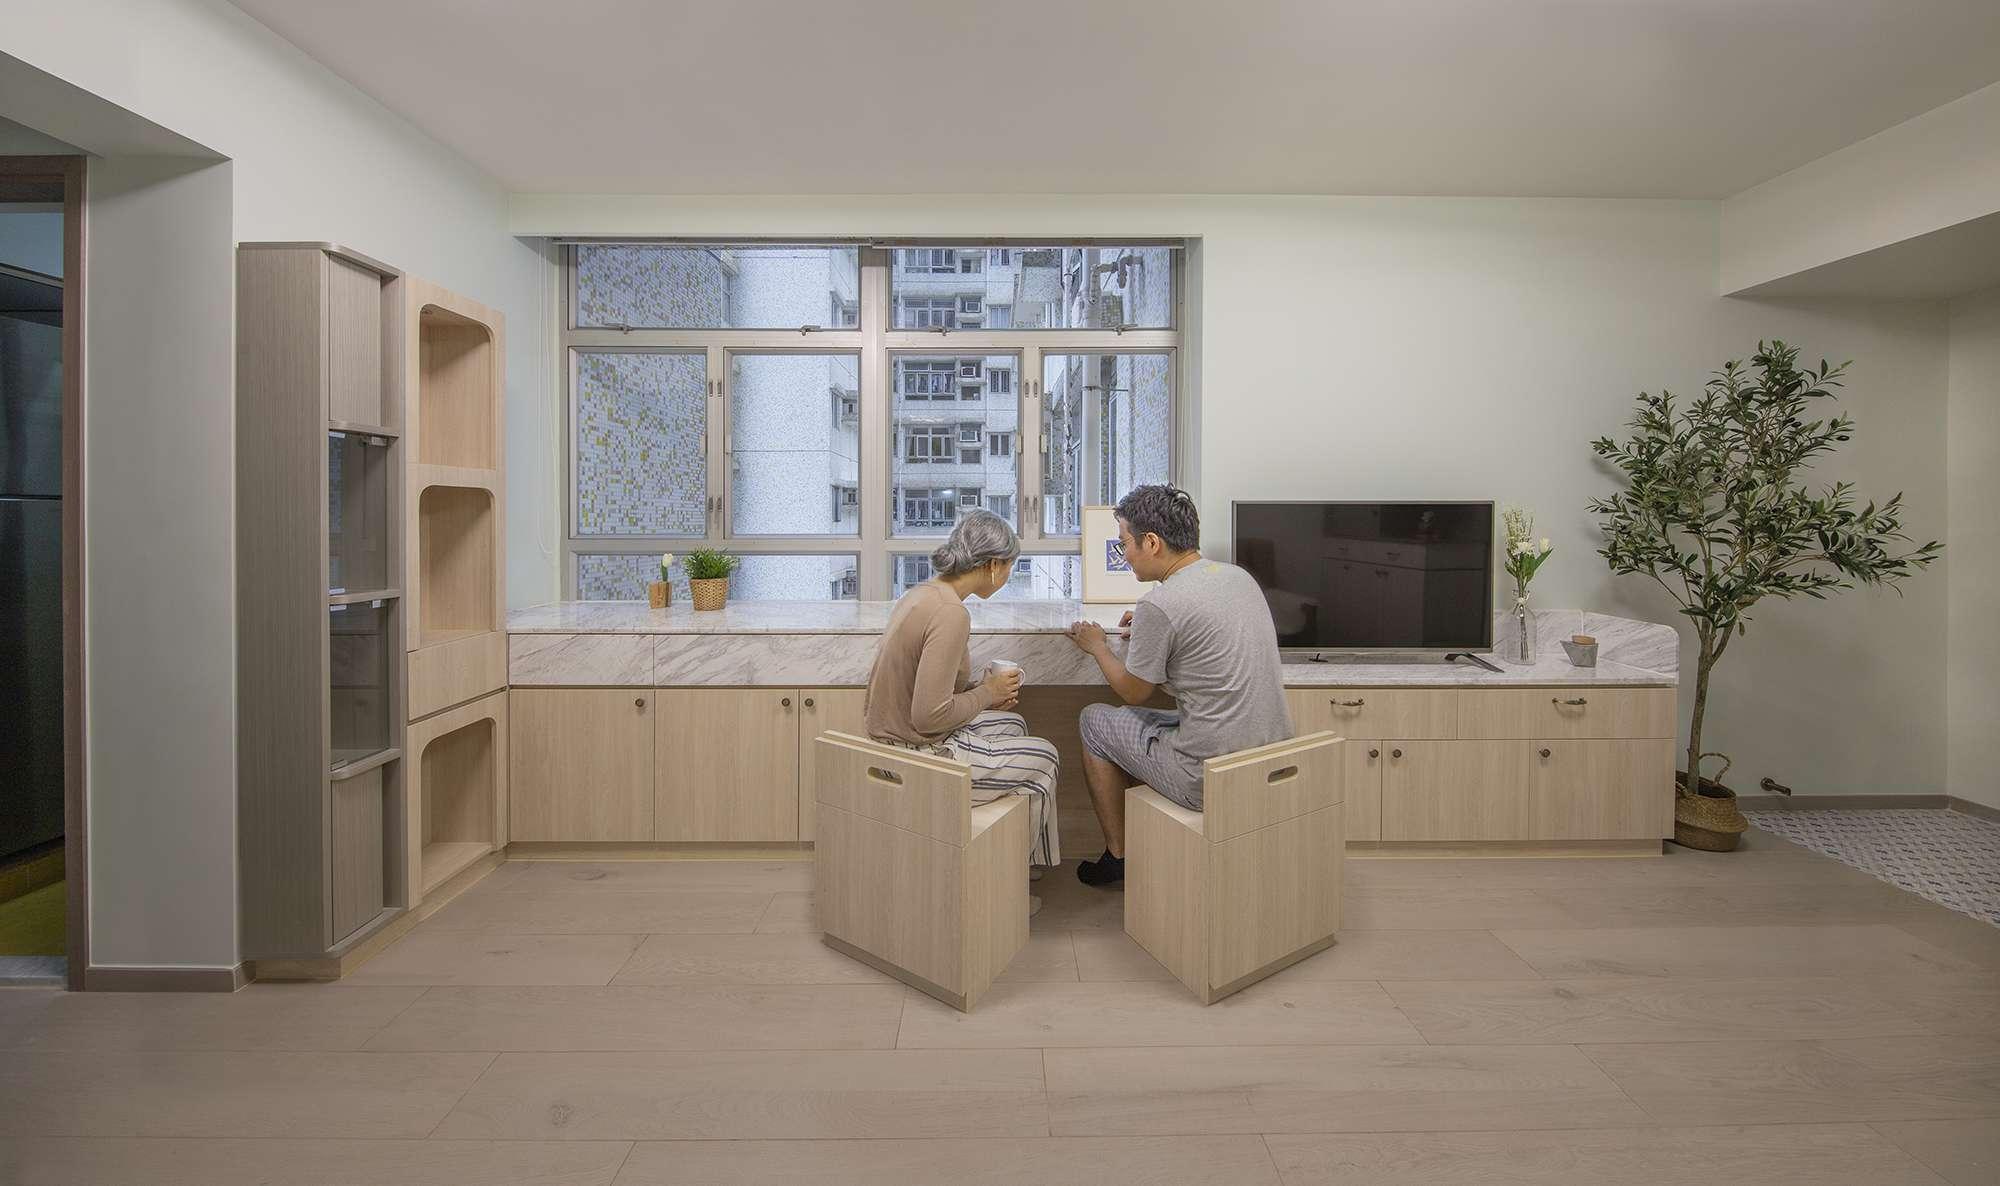 Floral Aged House apartment renovation by Sim-Plex Design Studio chairs